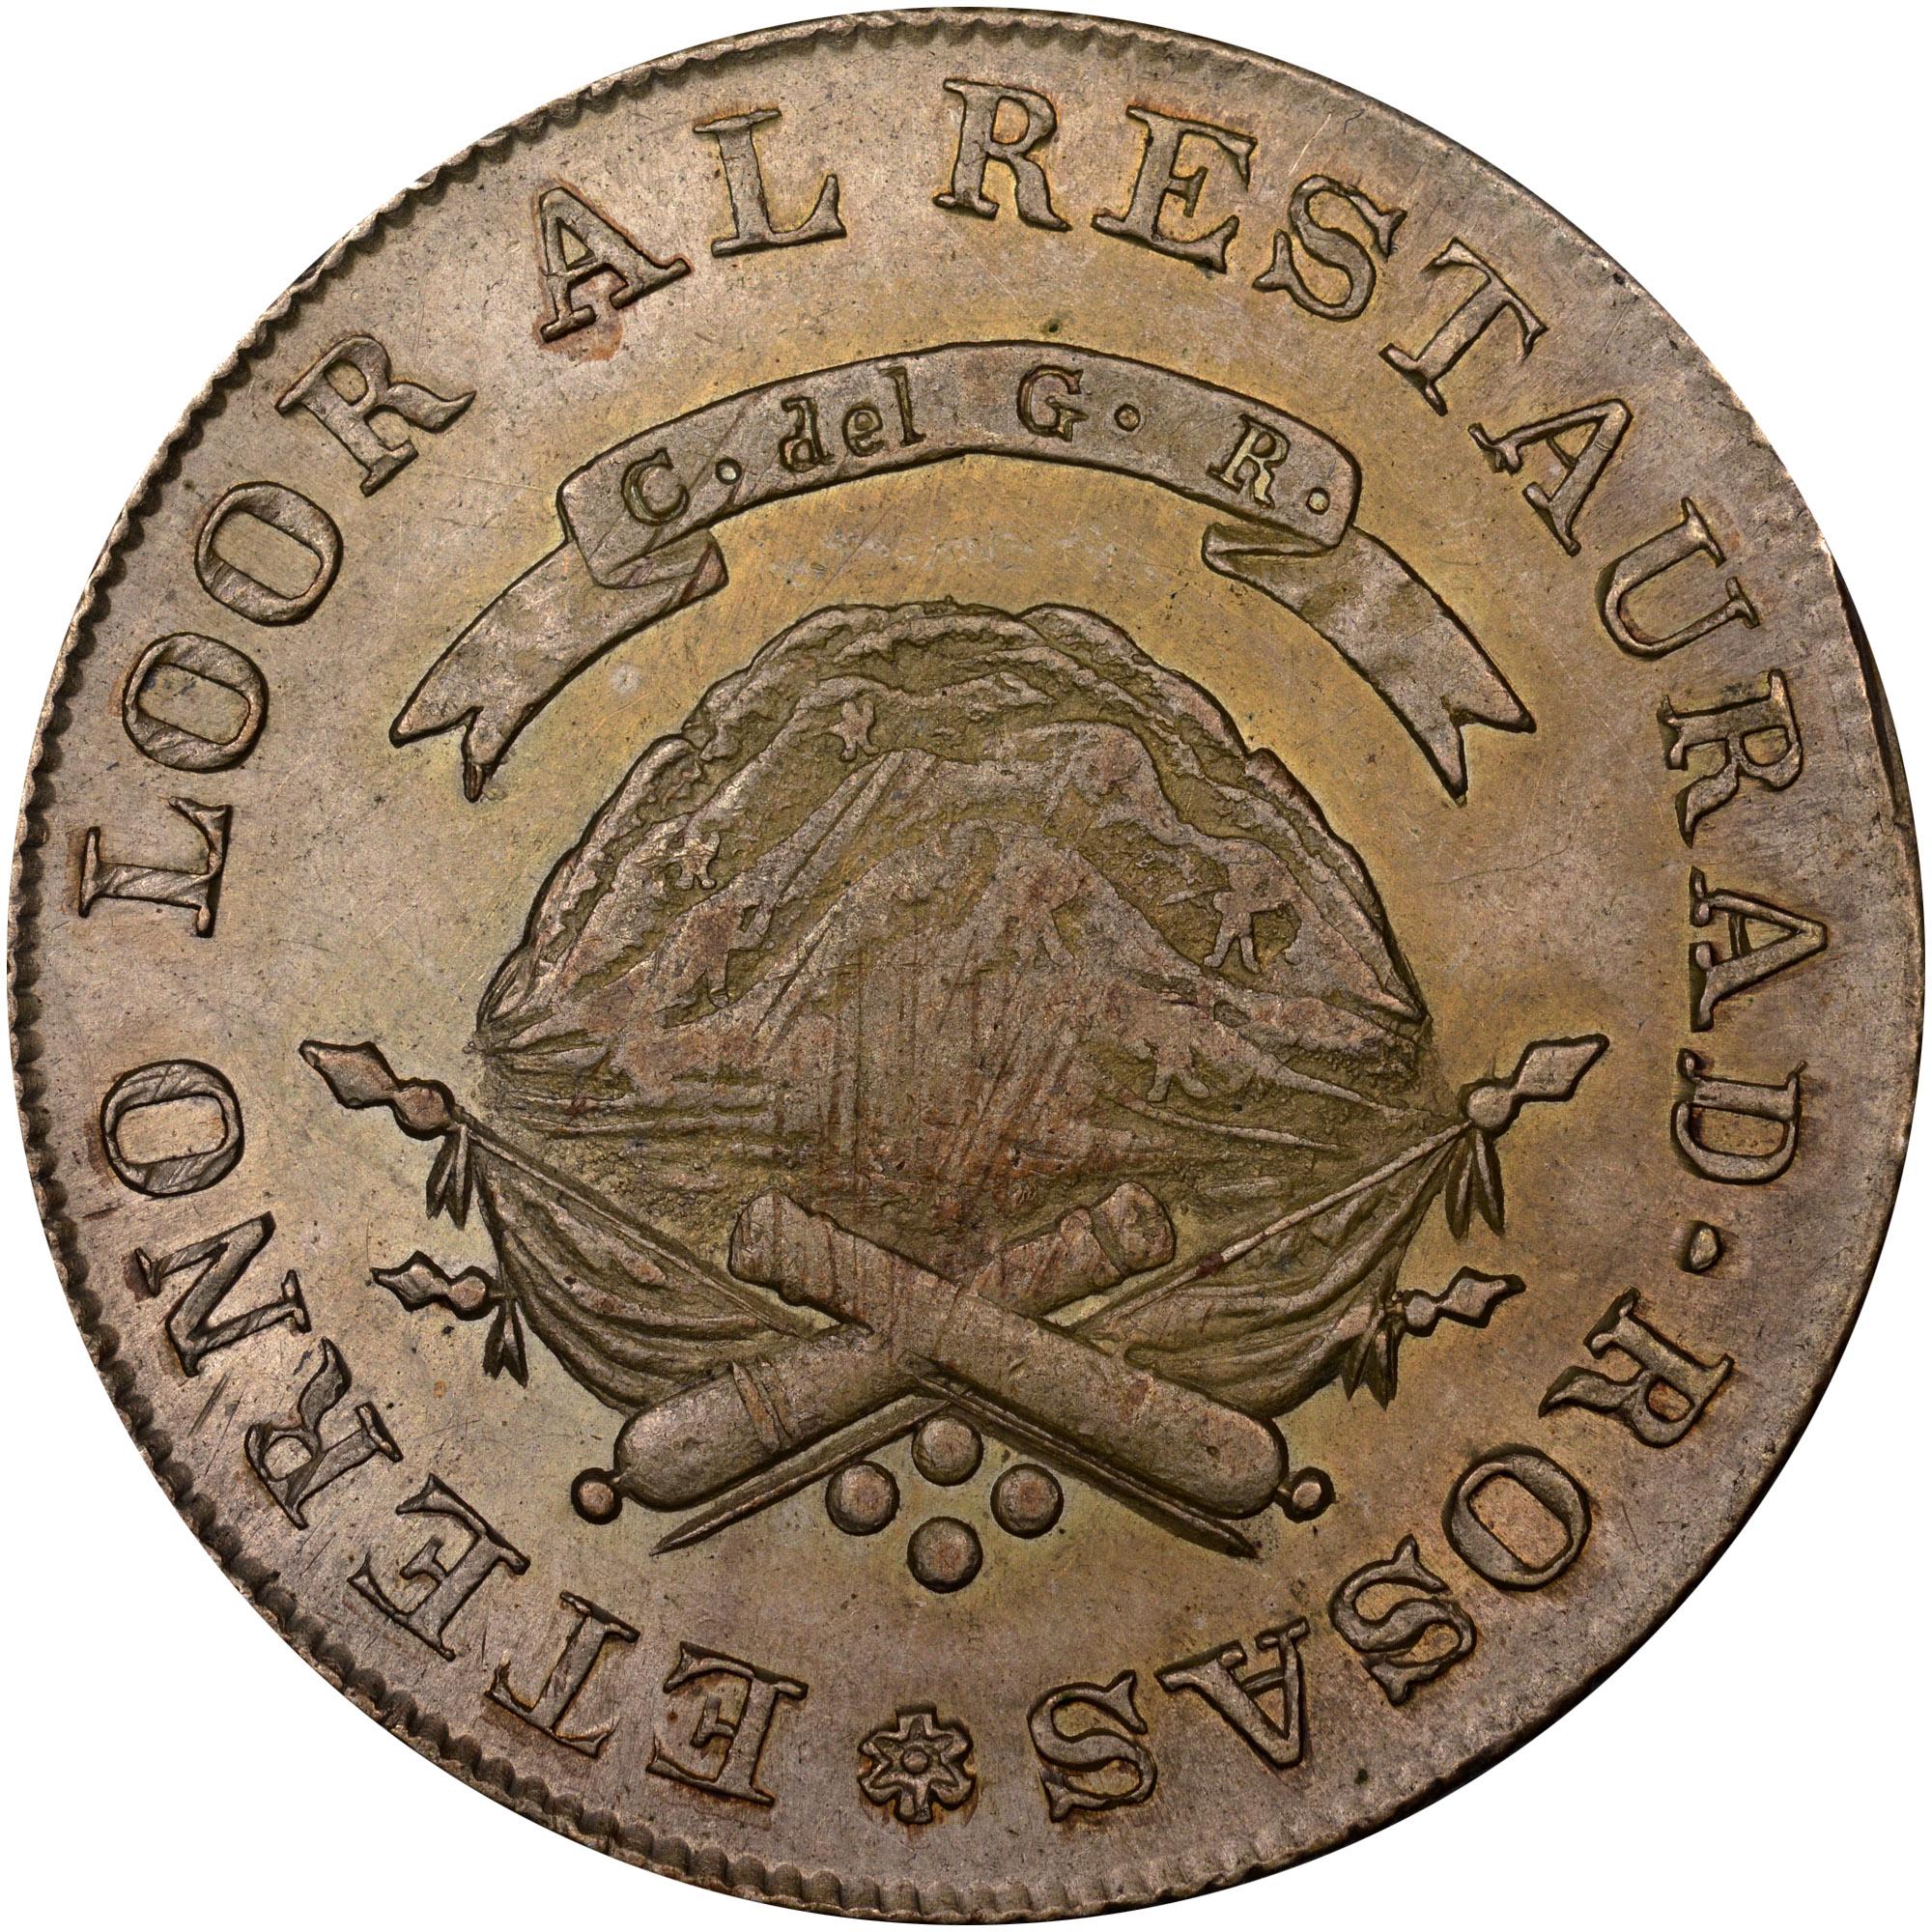 1846-1850 Argentina LA RIOJA 4 Reales reverse